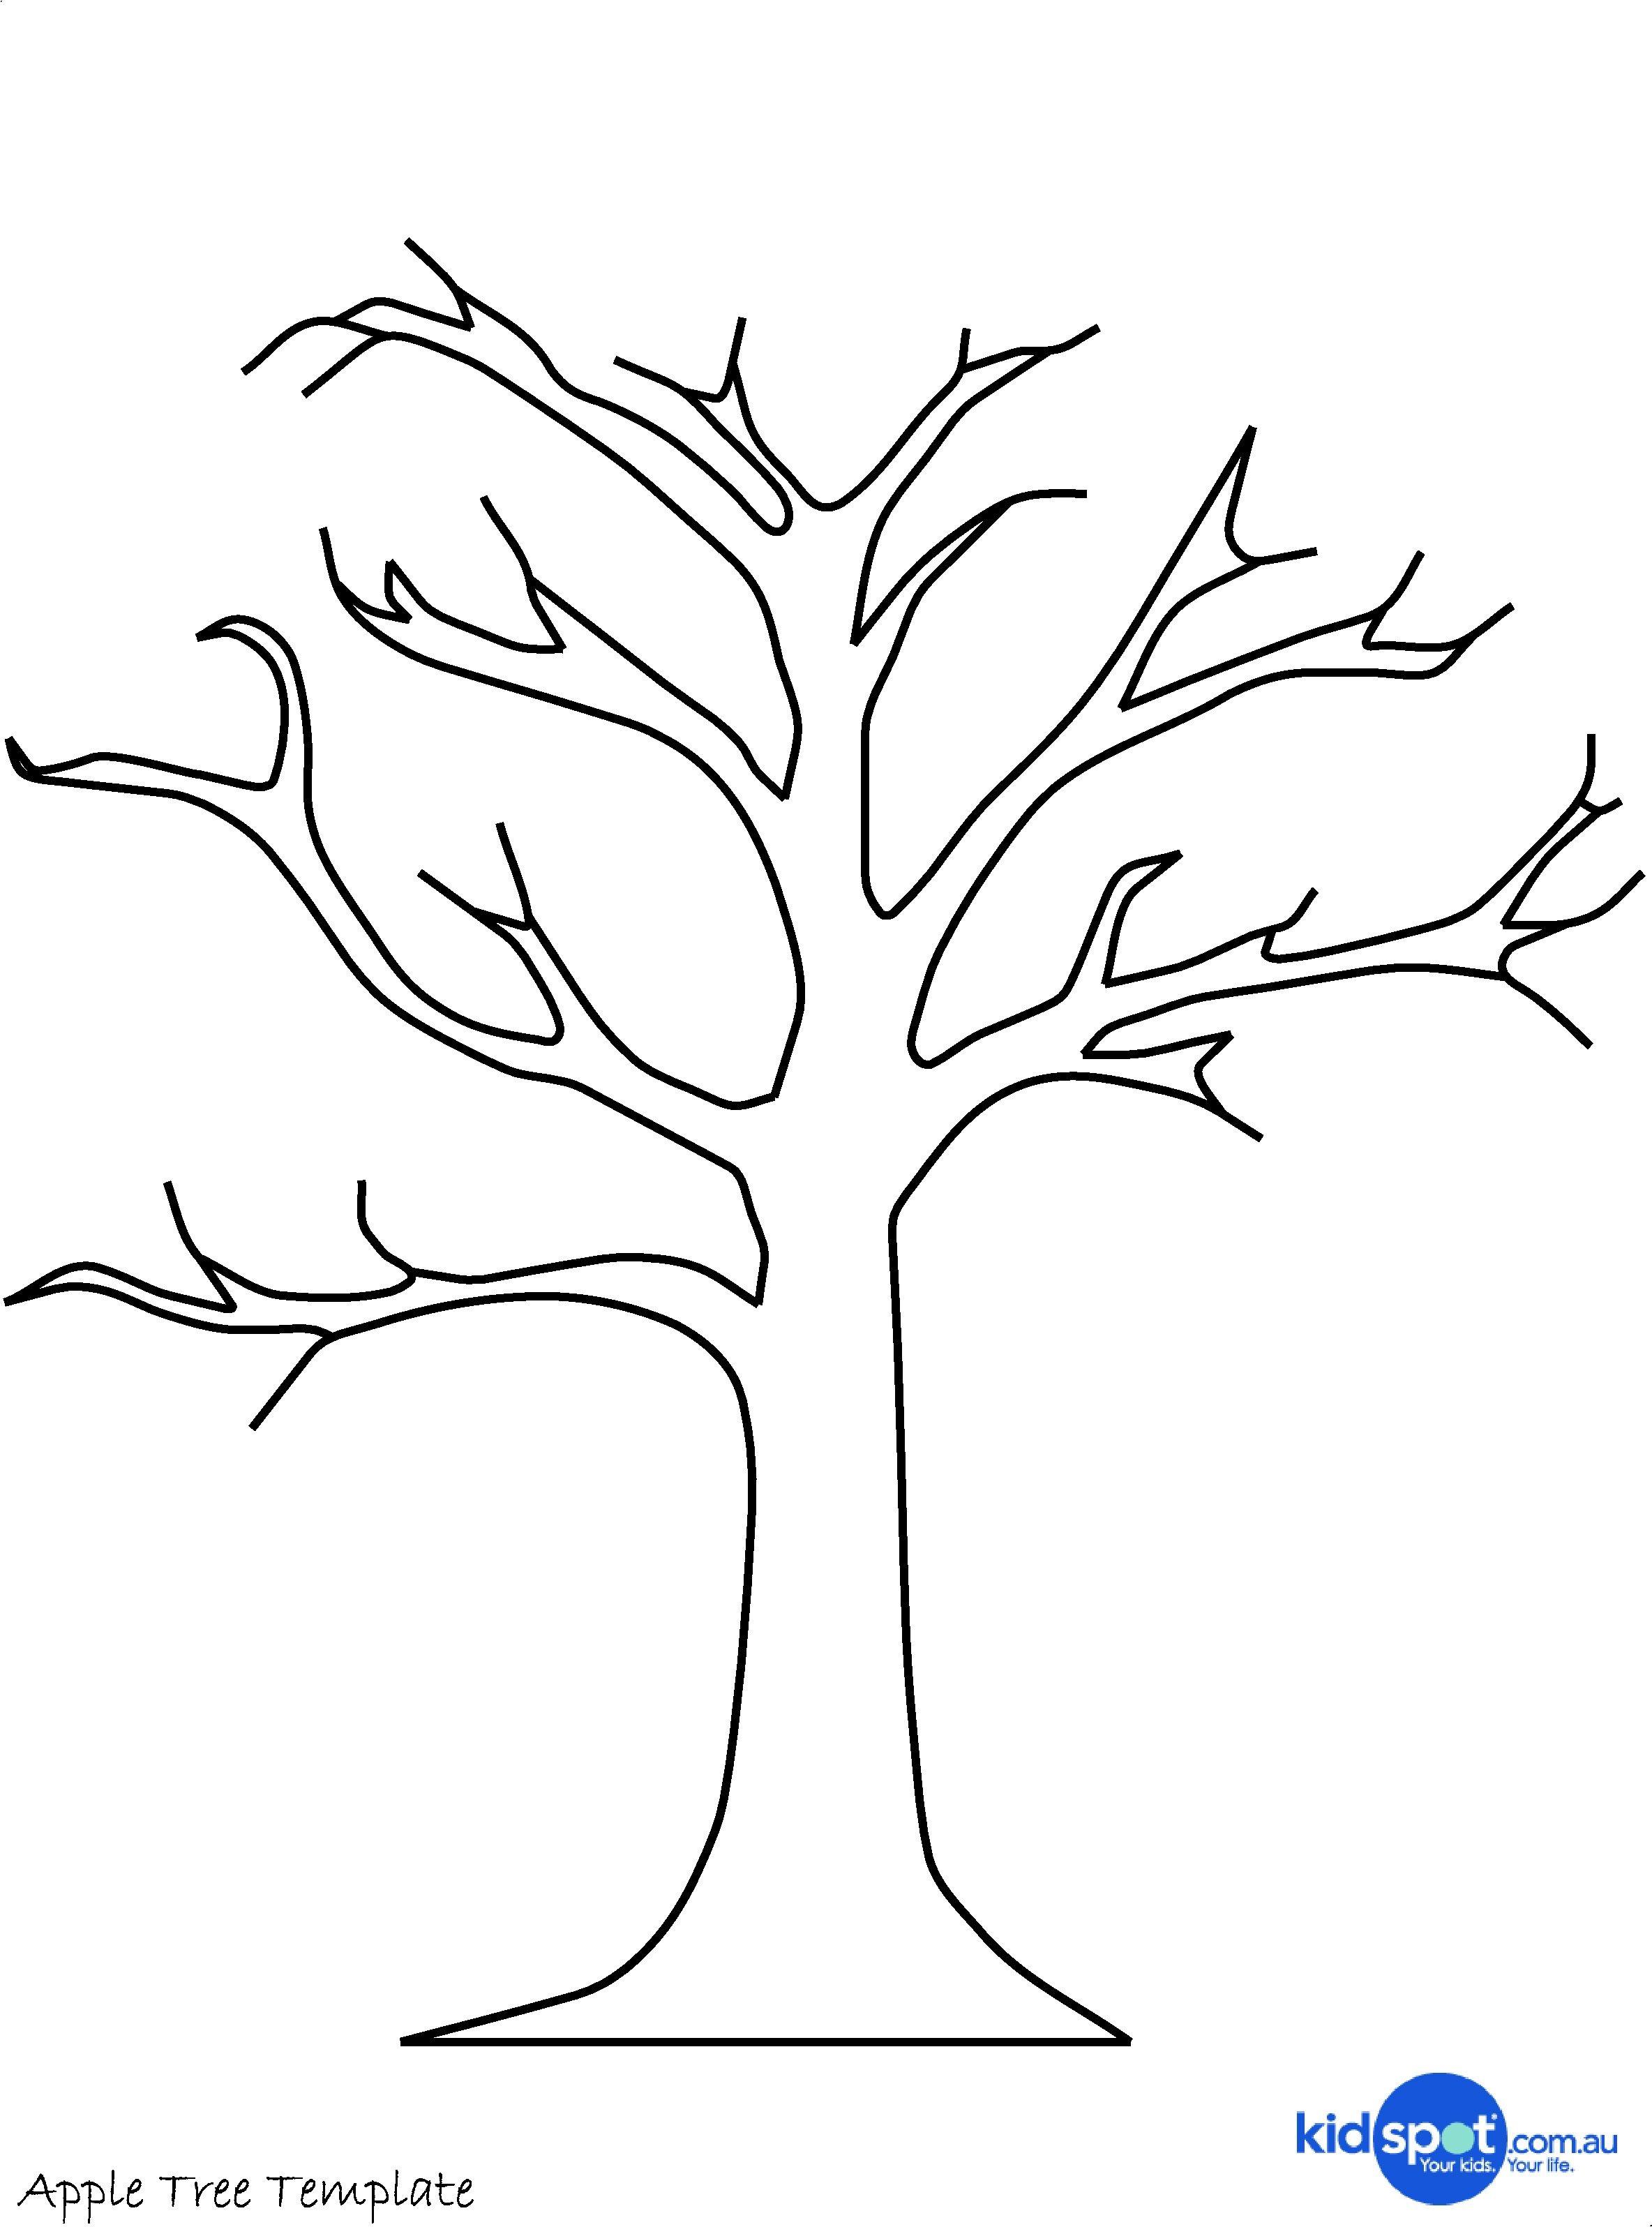 Printable Tree Template | Tree Craft - Cork Stamp Apple Tree - Art - Free Printable Tree Template